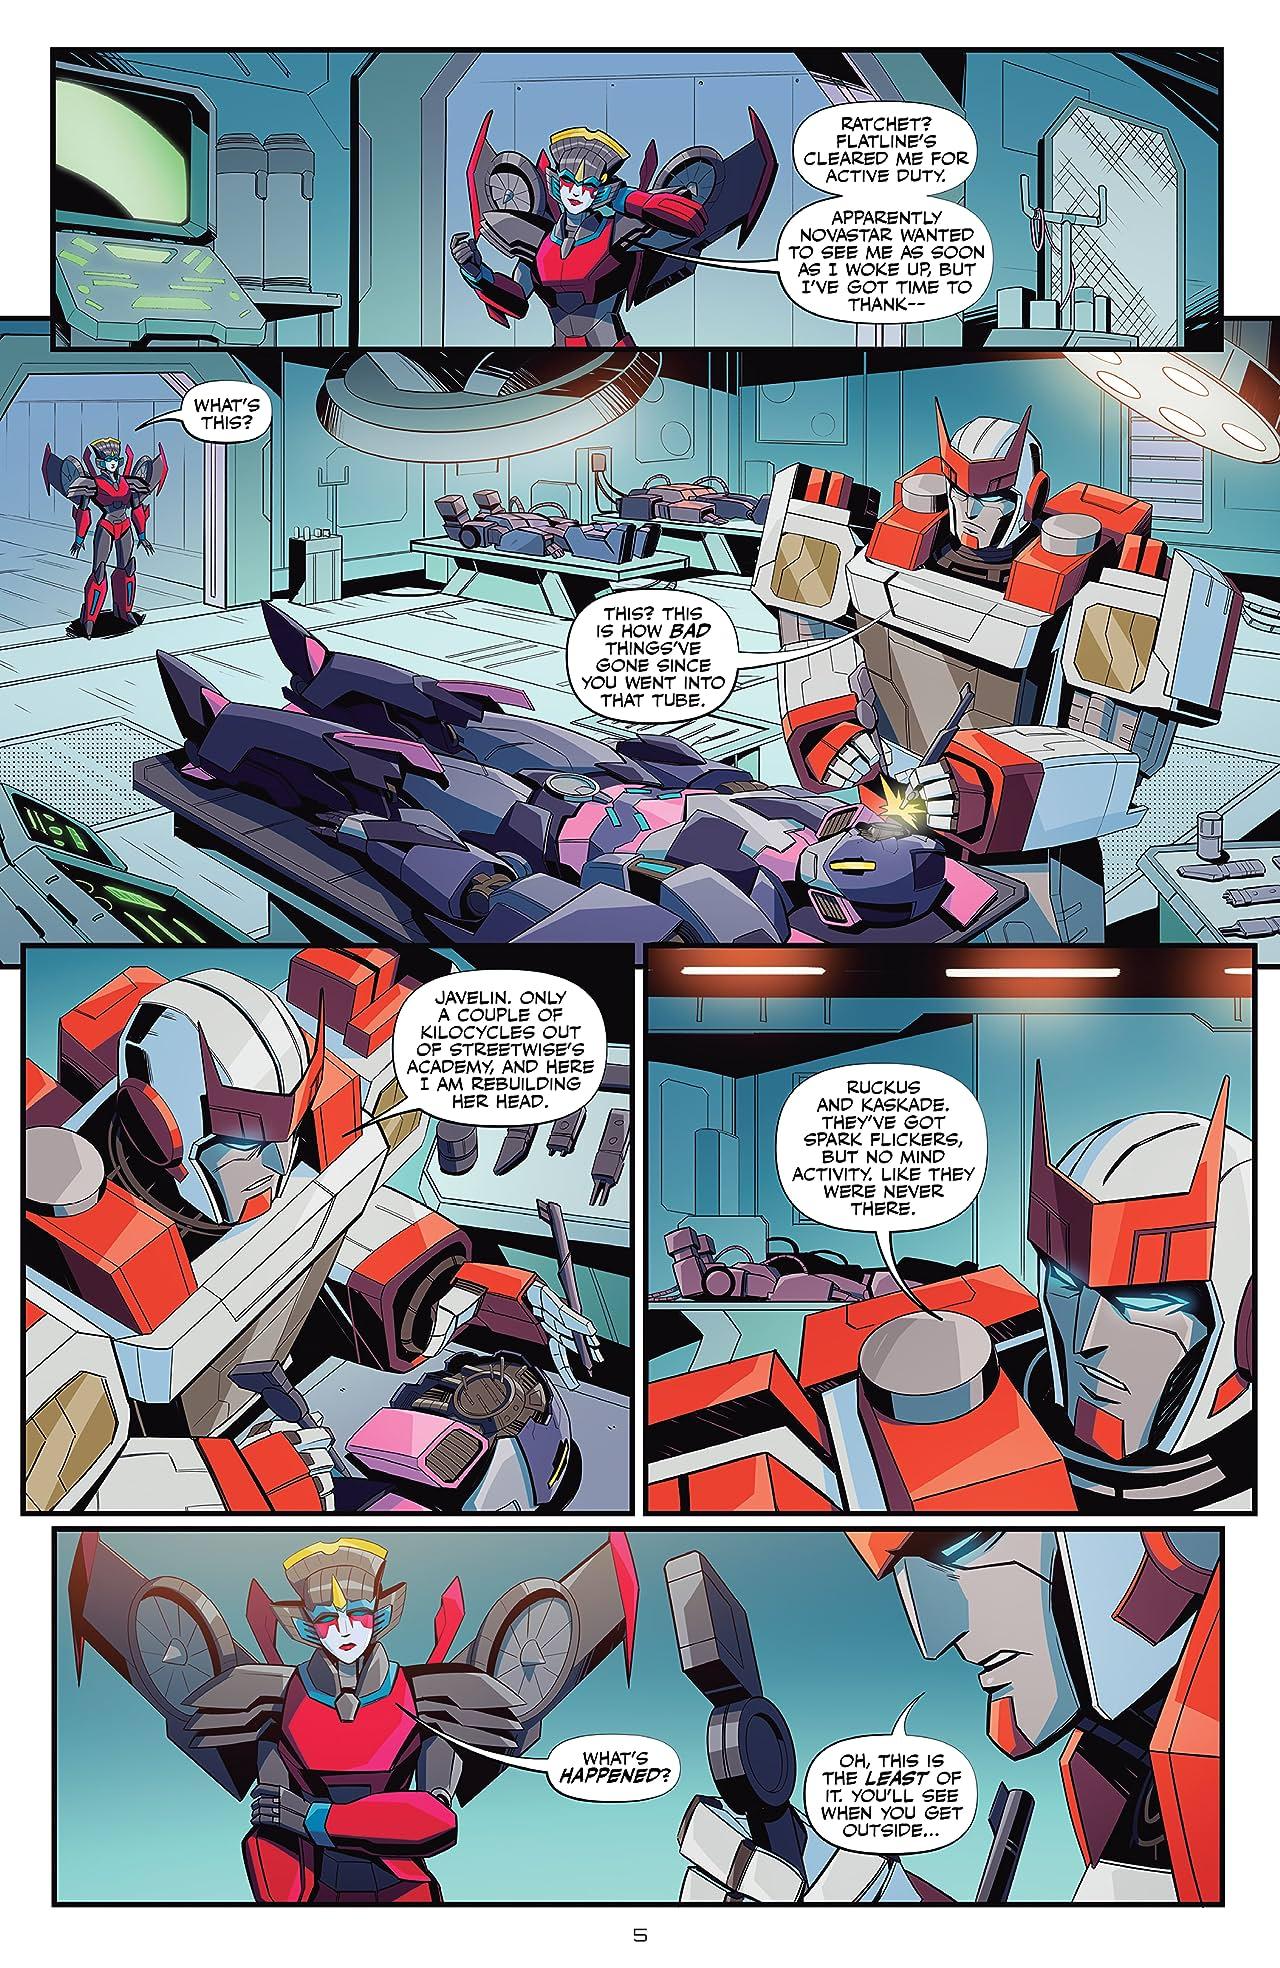 Transformers Vol. 3: All Fall Down